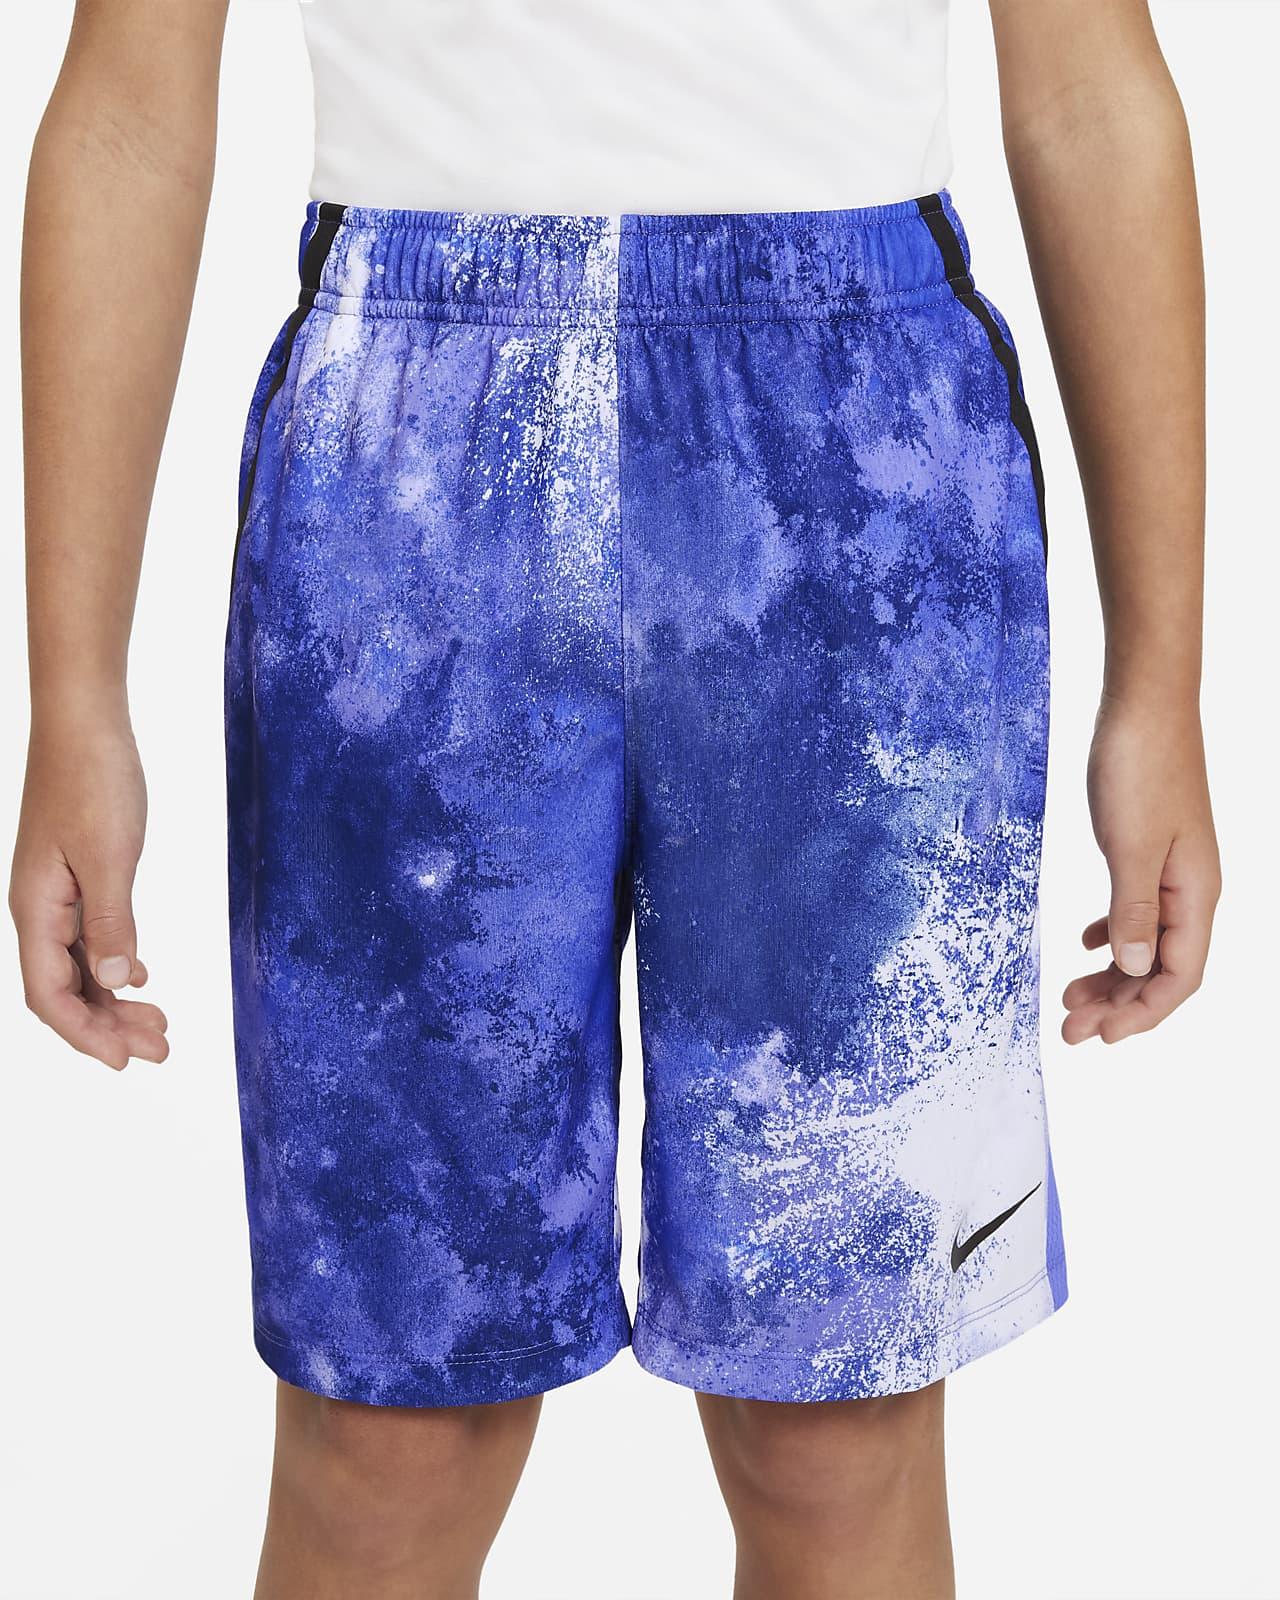 Nike Dri-FIT Older Kids' (Boys') Tie-Dye Training Shorts